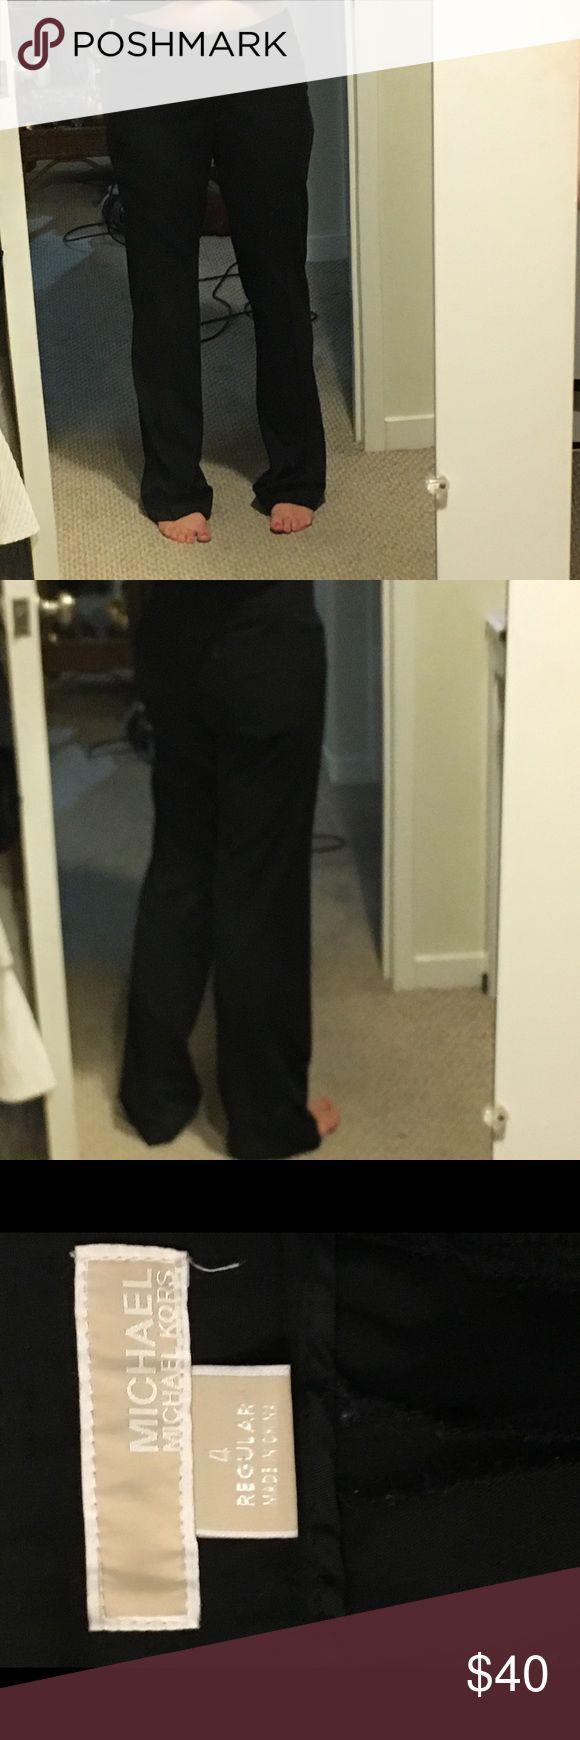 Michael Kors trousers Black Michael Kors trousers. EUC. Michael Kors Pants Trousers